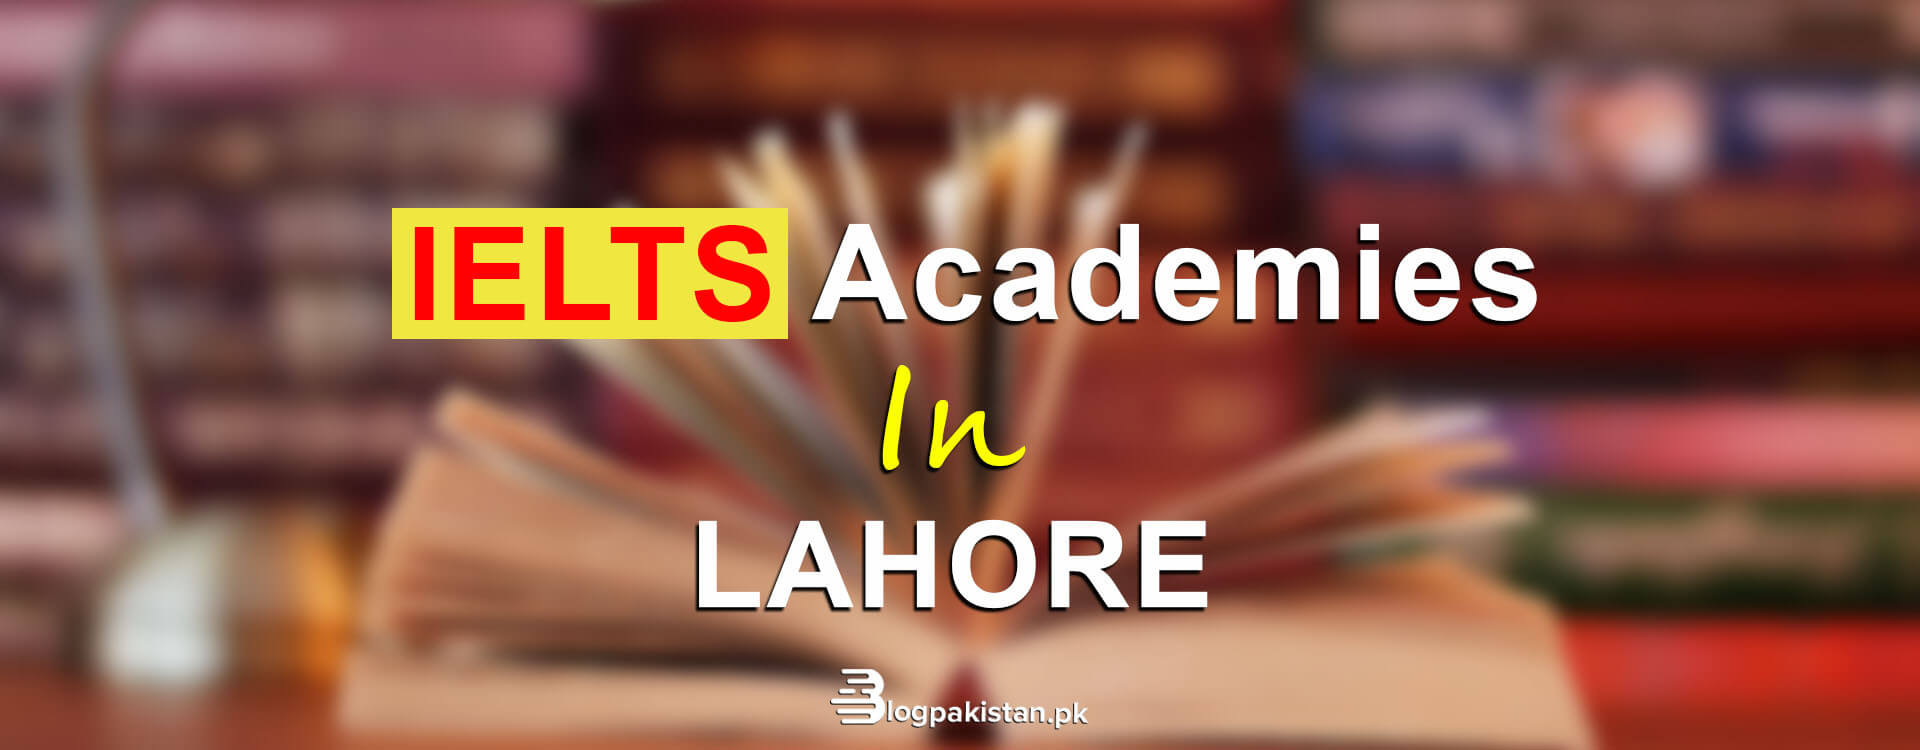 IELTS academies in Lahore